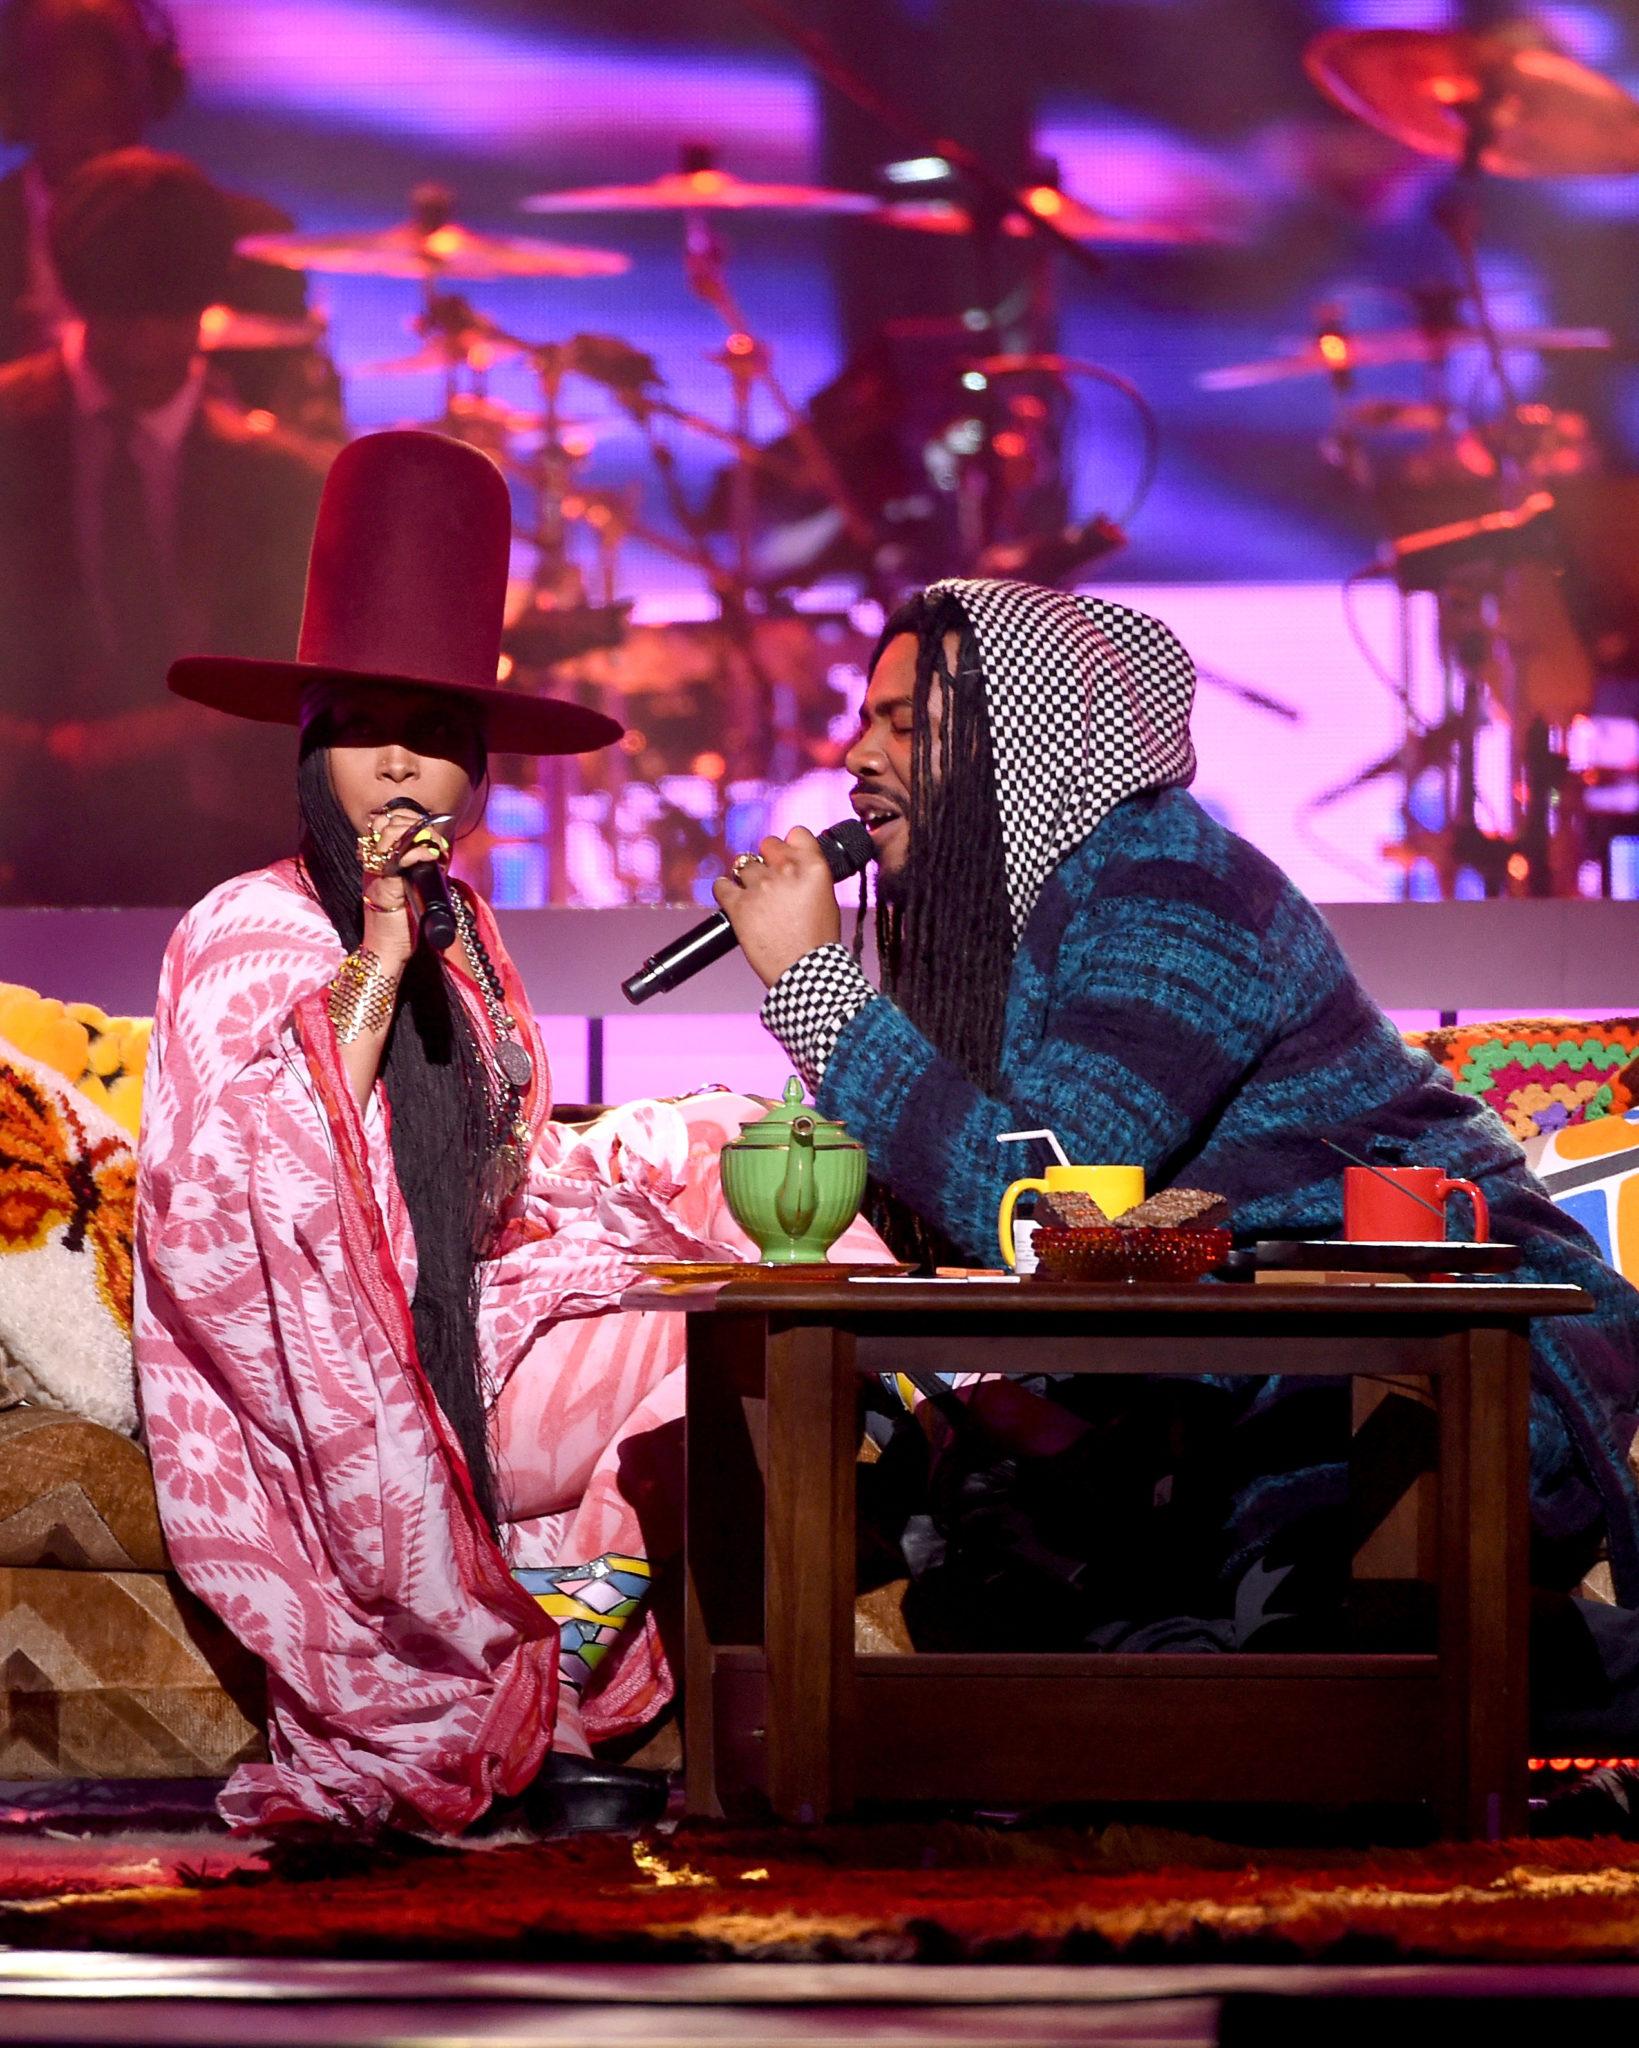 Erykah Badu & D.R.A.M Perform During The 'Soul Train Awards'